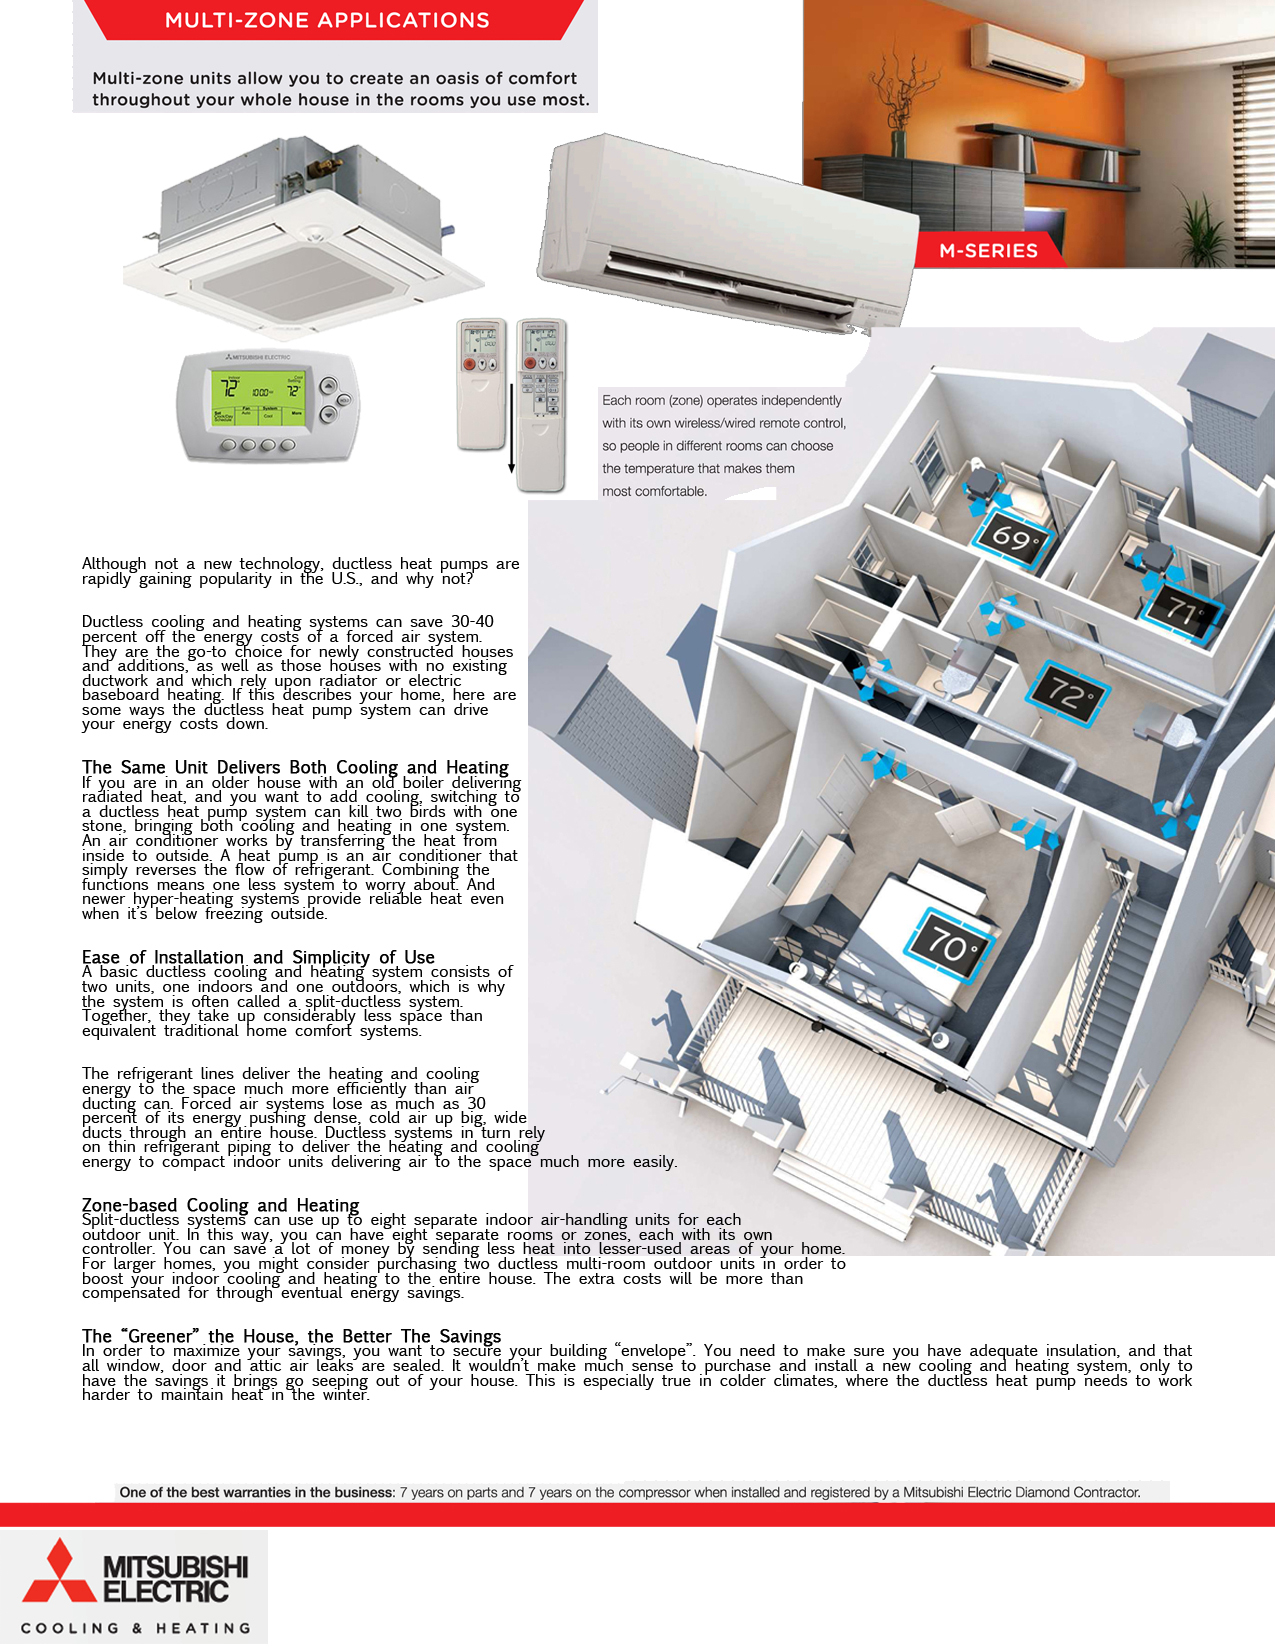 mitsubishi m series wiring diagram mitsubishi mini split 5 zone mitsubishi up to 19 7 seer heat pump system on mitsubishi m acircmiddot wiring schematics